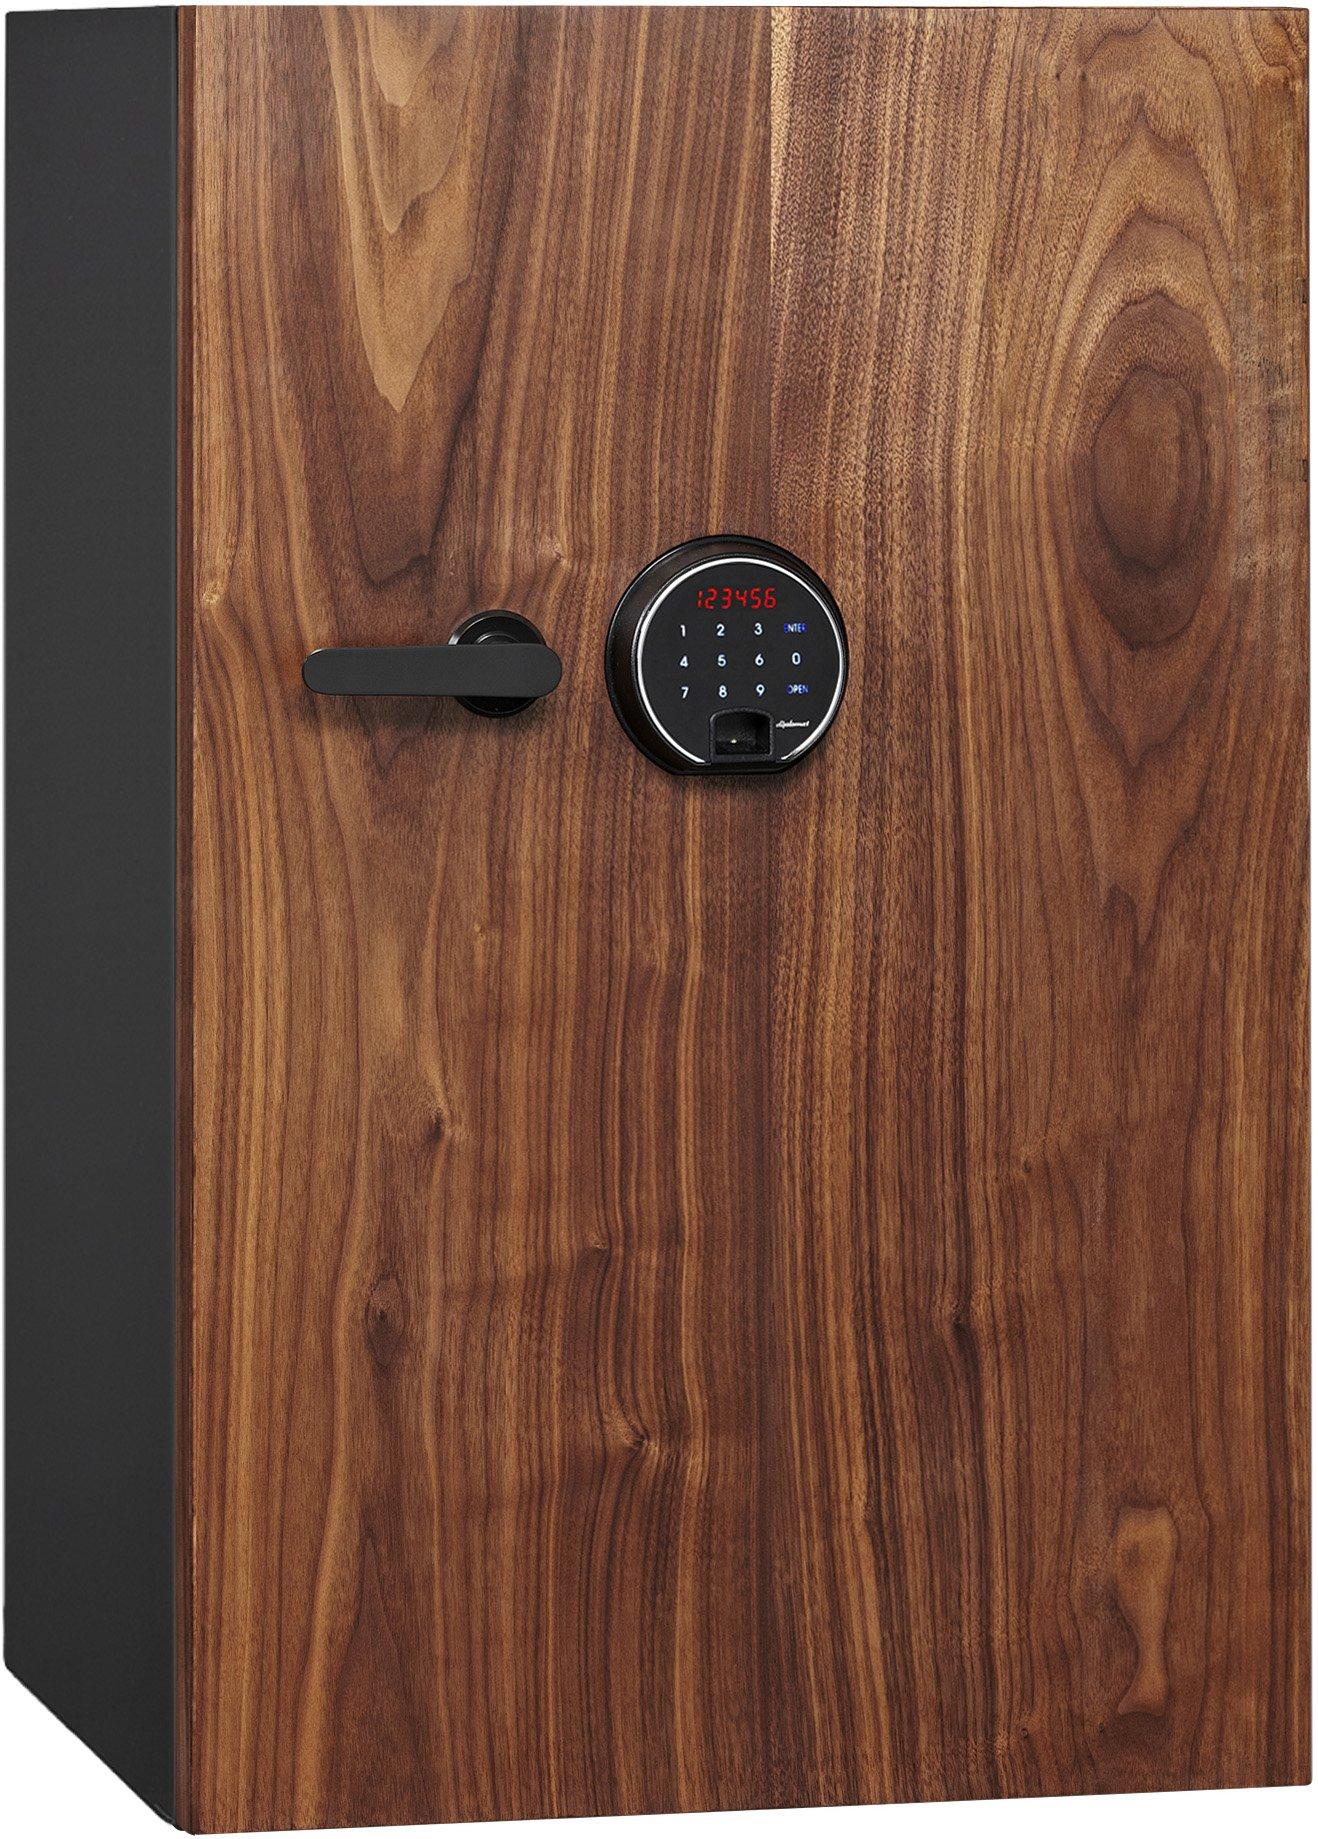 Phoenix DBAUM Fingerprint Lock Luxury Fireproof Safe with Walnut Door 3.0 cu ft